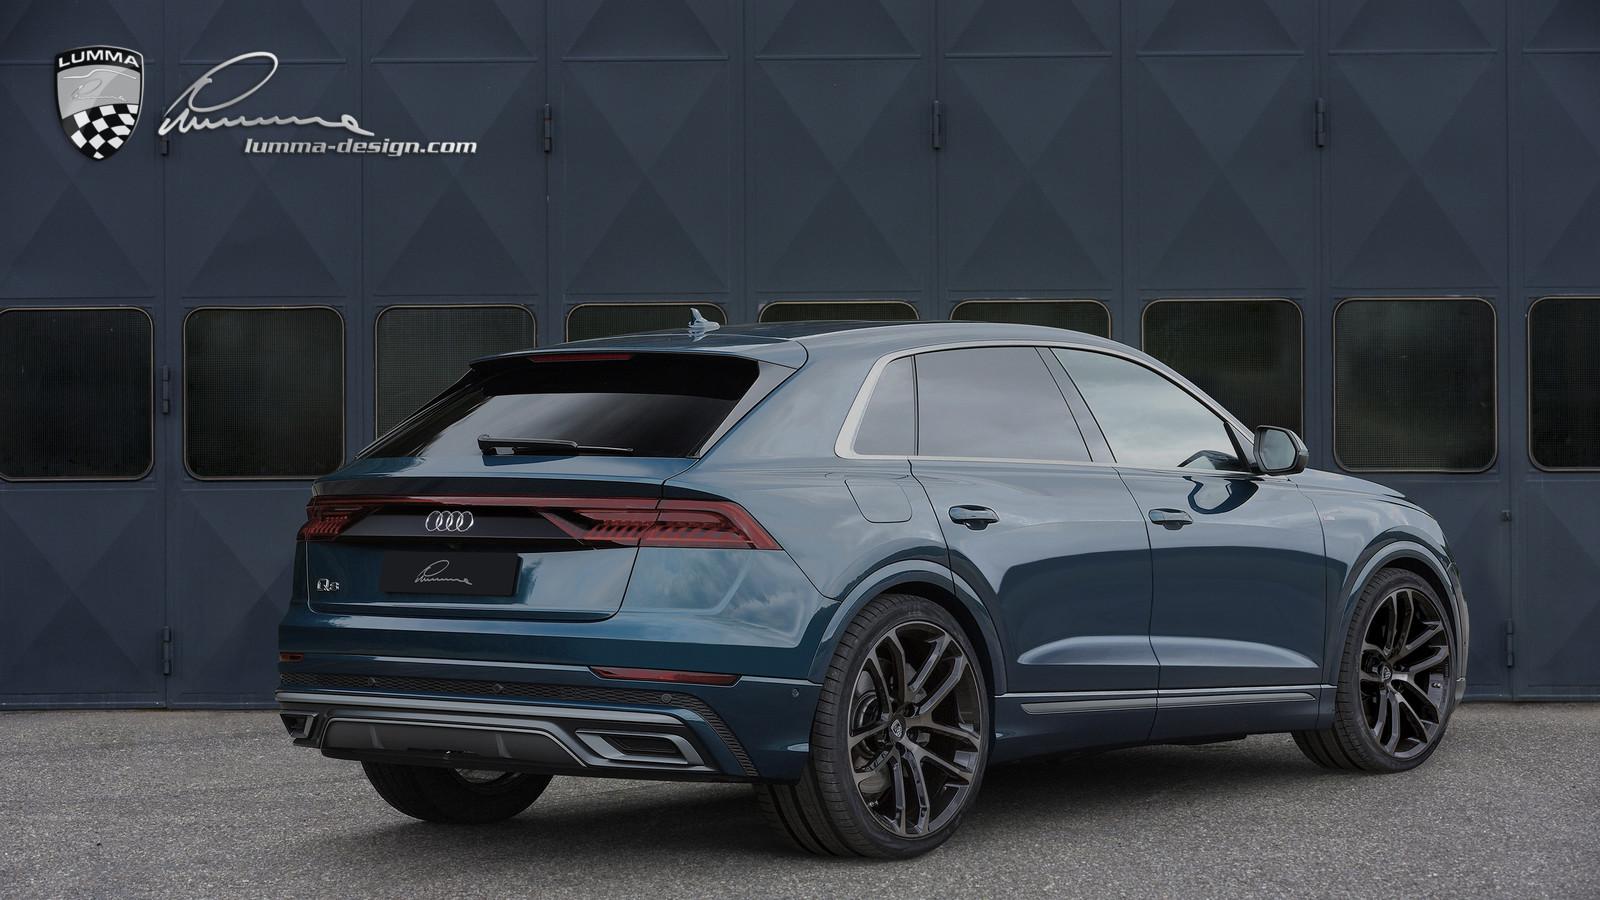 Audi Used For Sale >> LUMMA-NEWS: LUMMA CLR Racing for Audi Q8